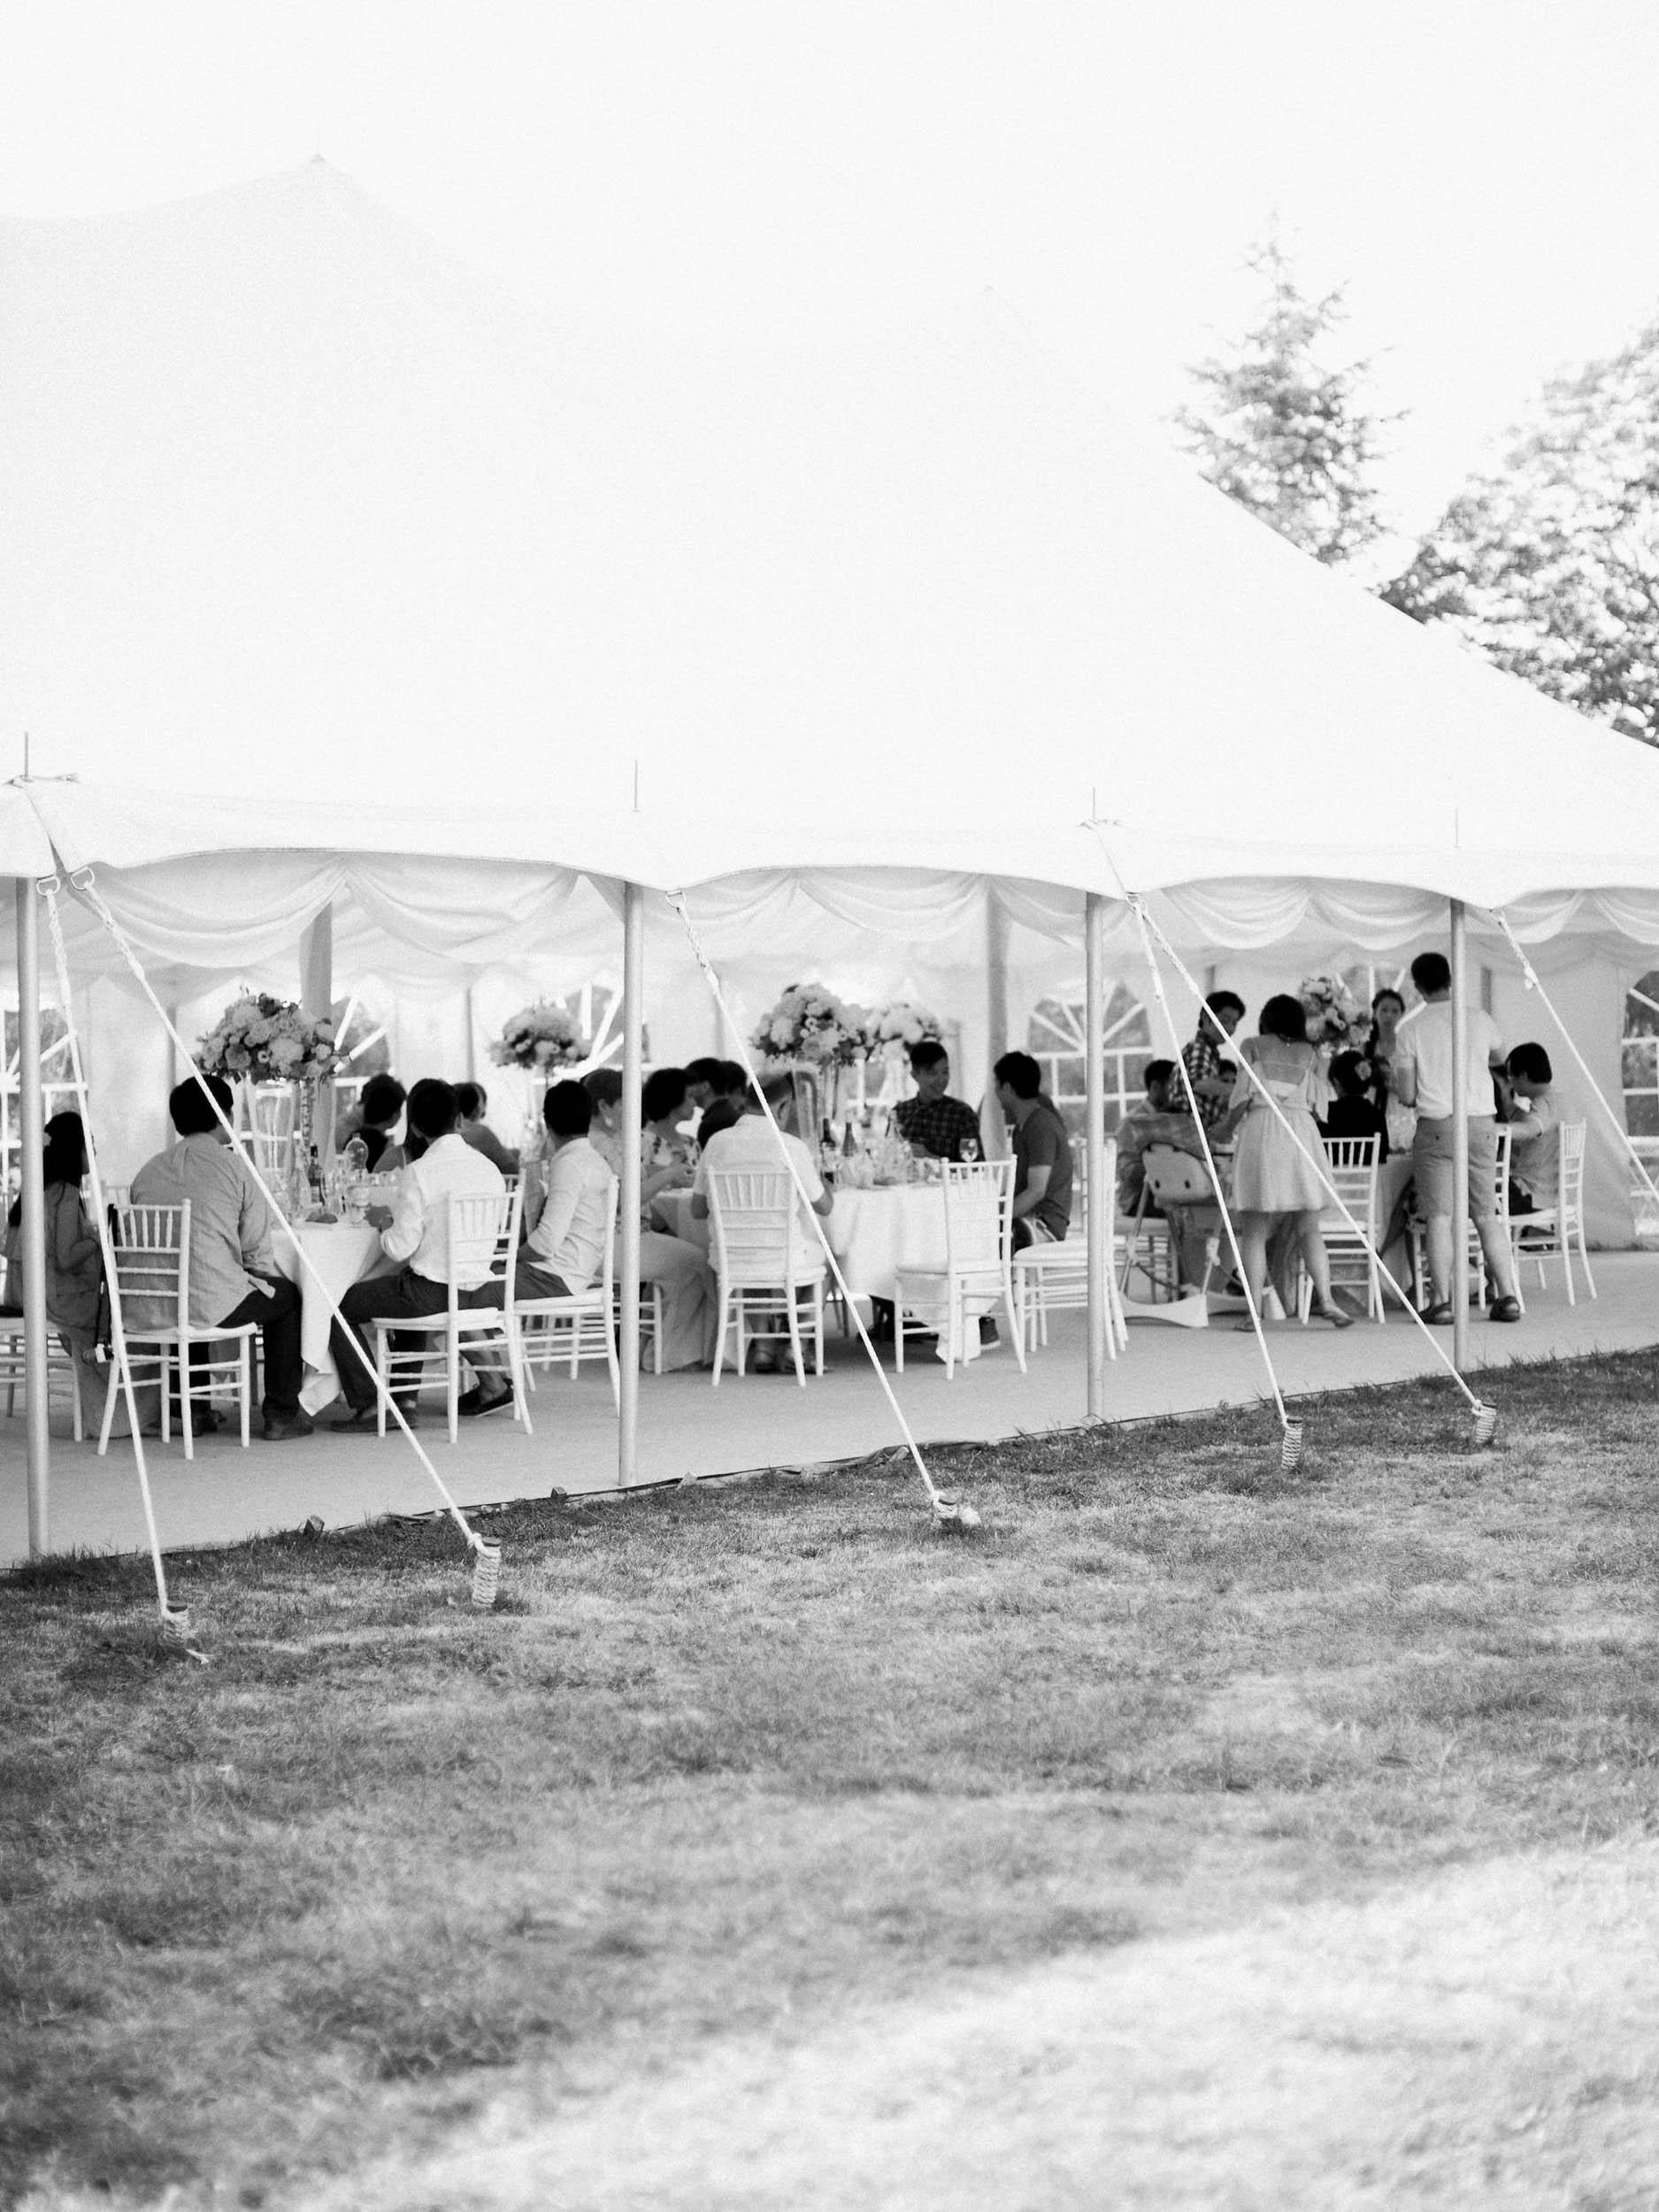 Amy O'Boyle Photography- Destination & UK Fine Art Film Wedding Photographer- Chateau La Durantie Wedding-47.jpg